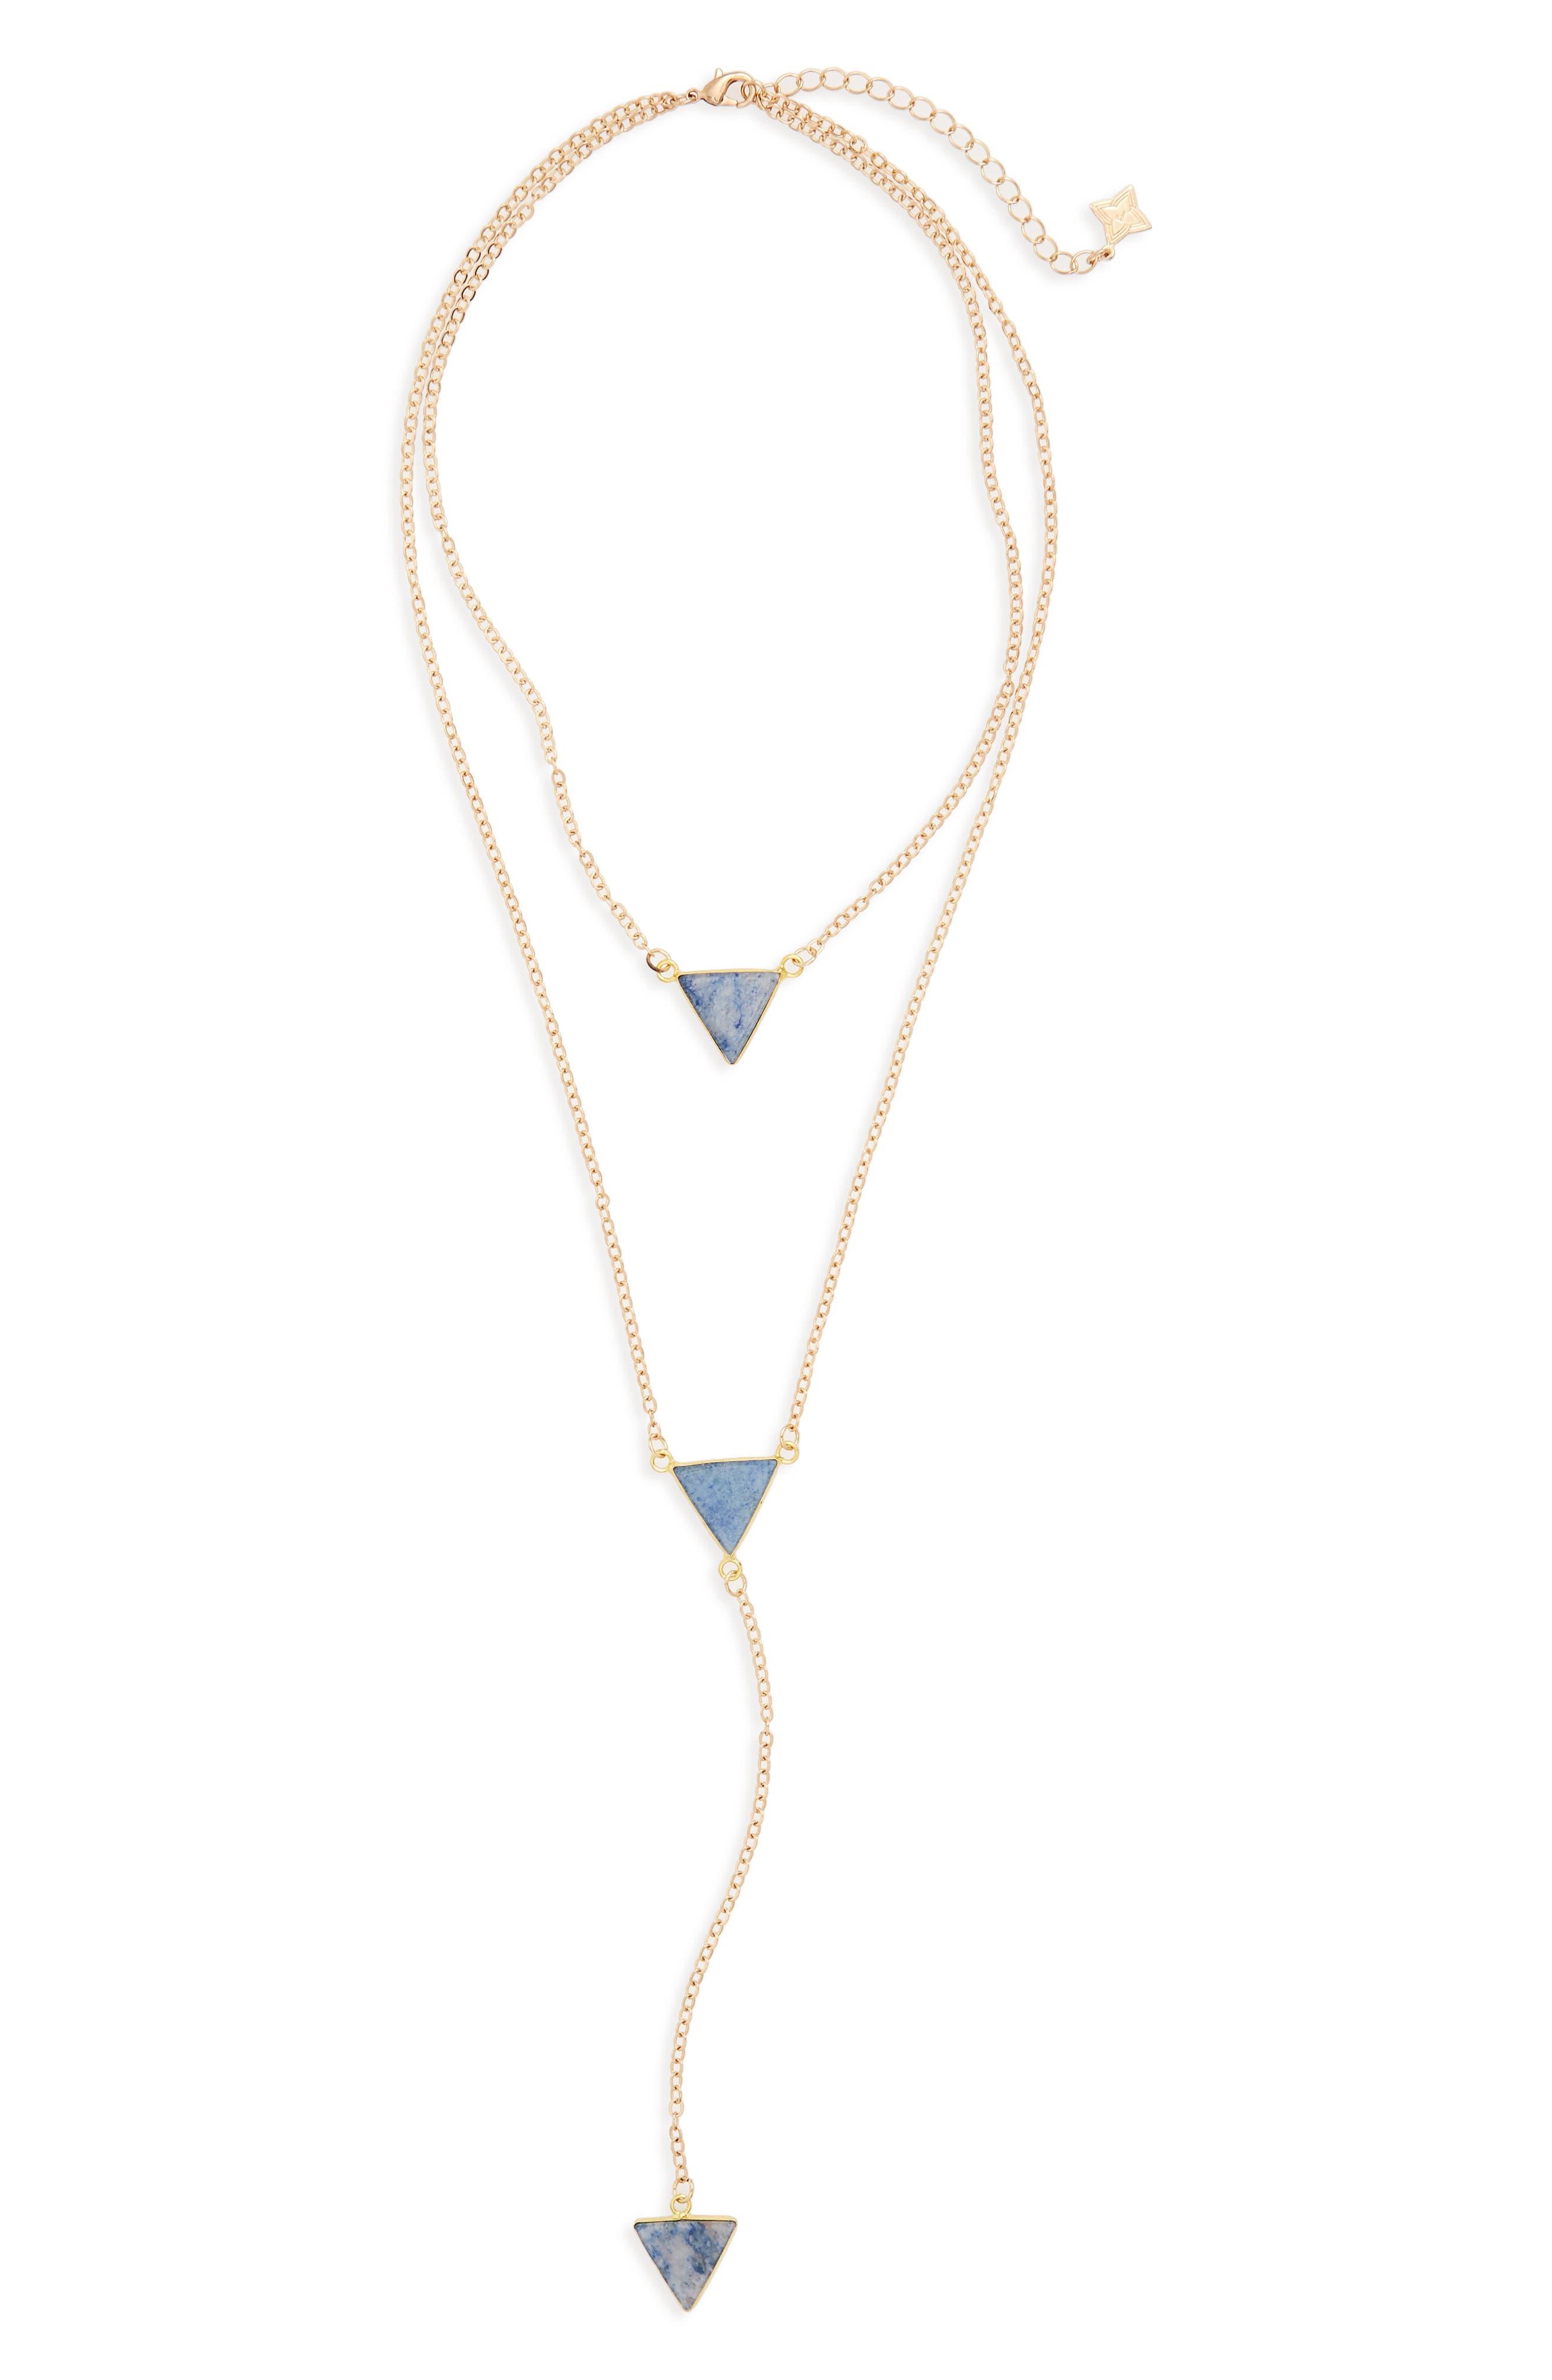 Main Image - Panacea Semiprecious Stone Layered Y-Necklace